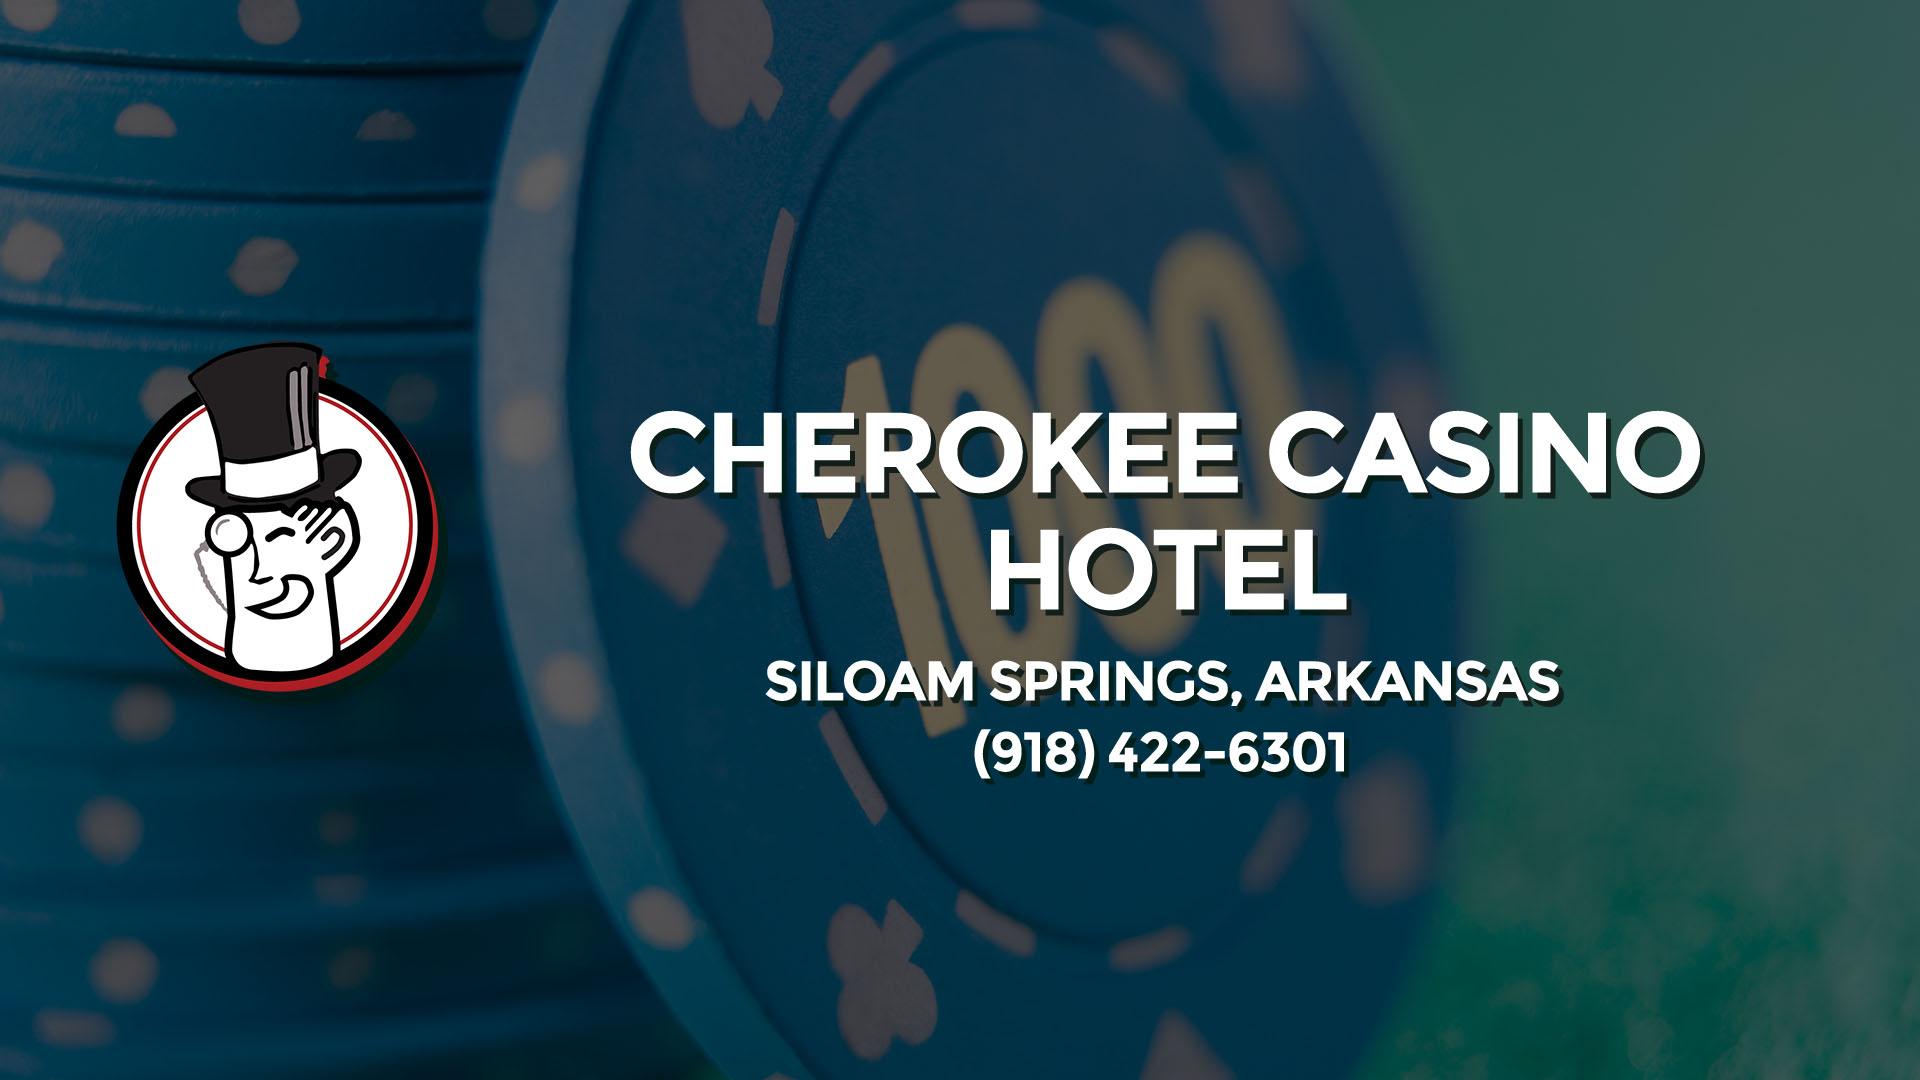 CHEROKEE CASINO  HOTEL SILOAM SPRINGS AR